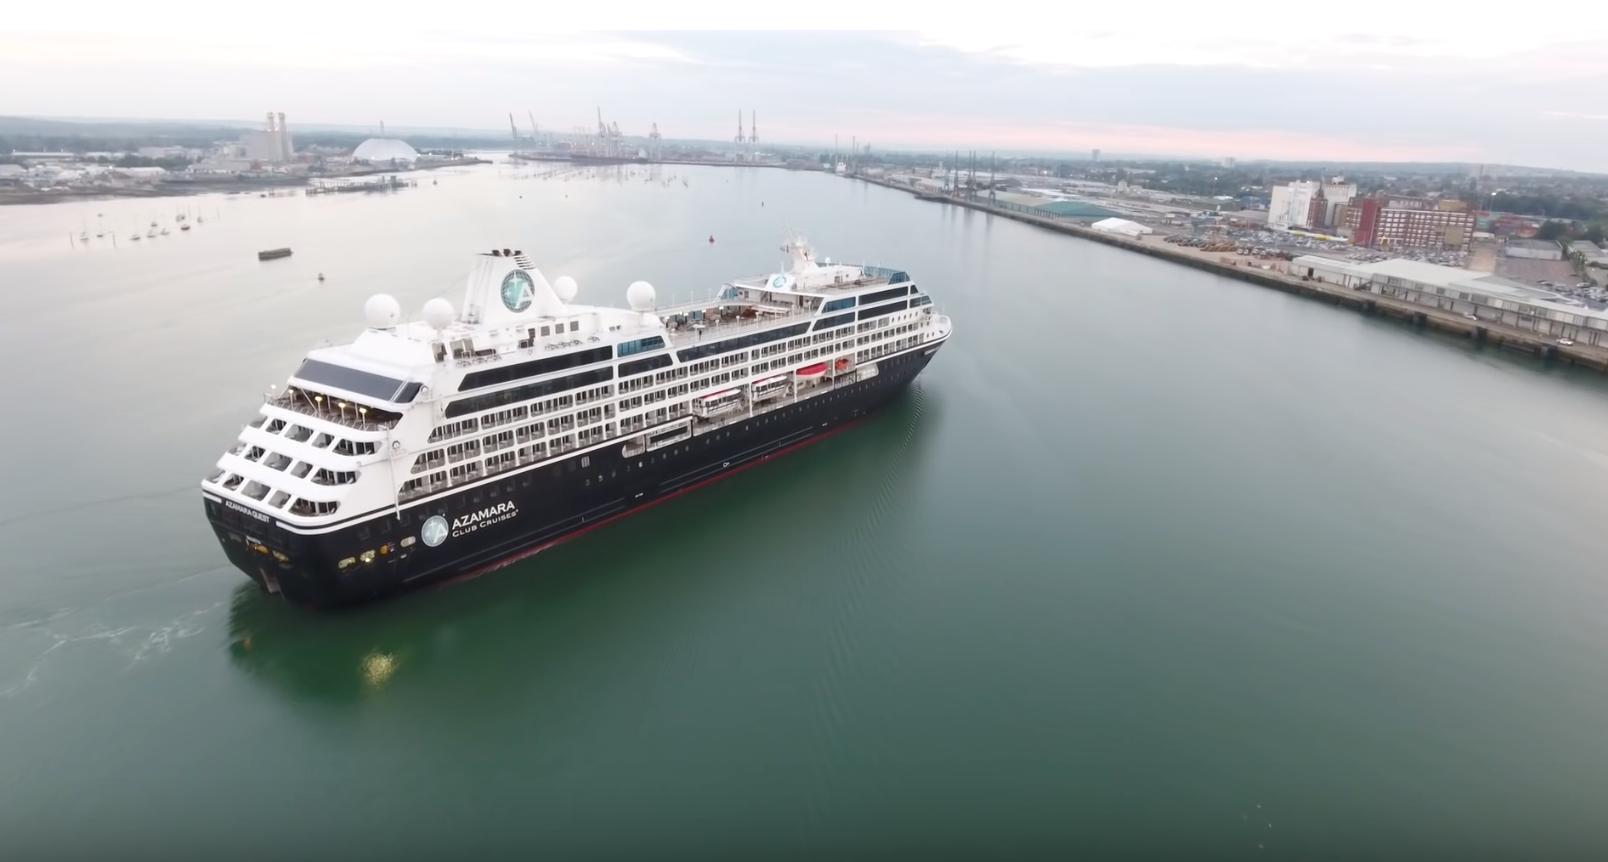 Azamara Crusie Ships -